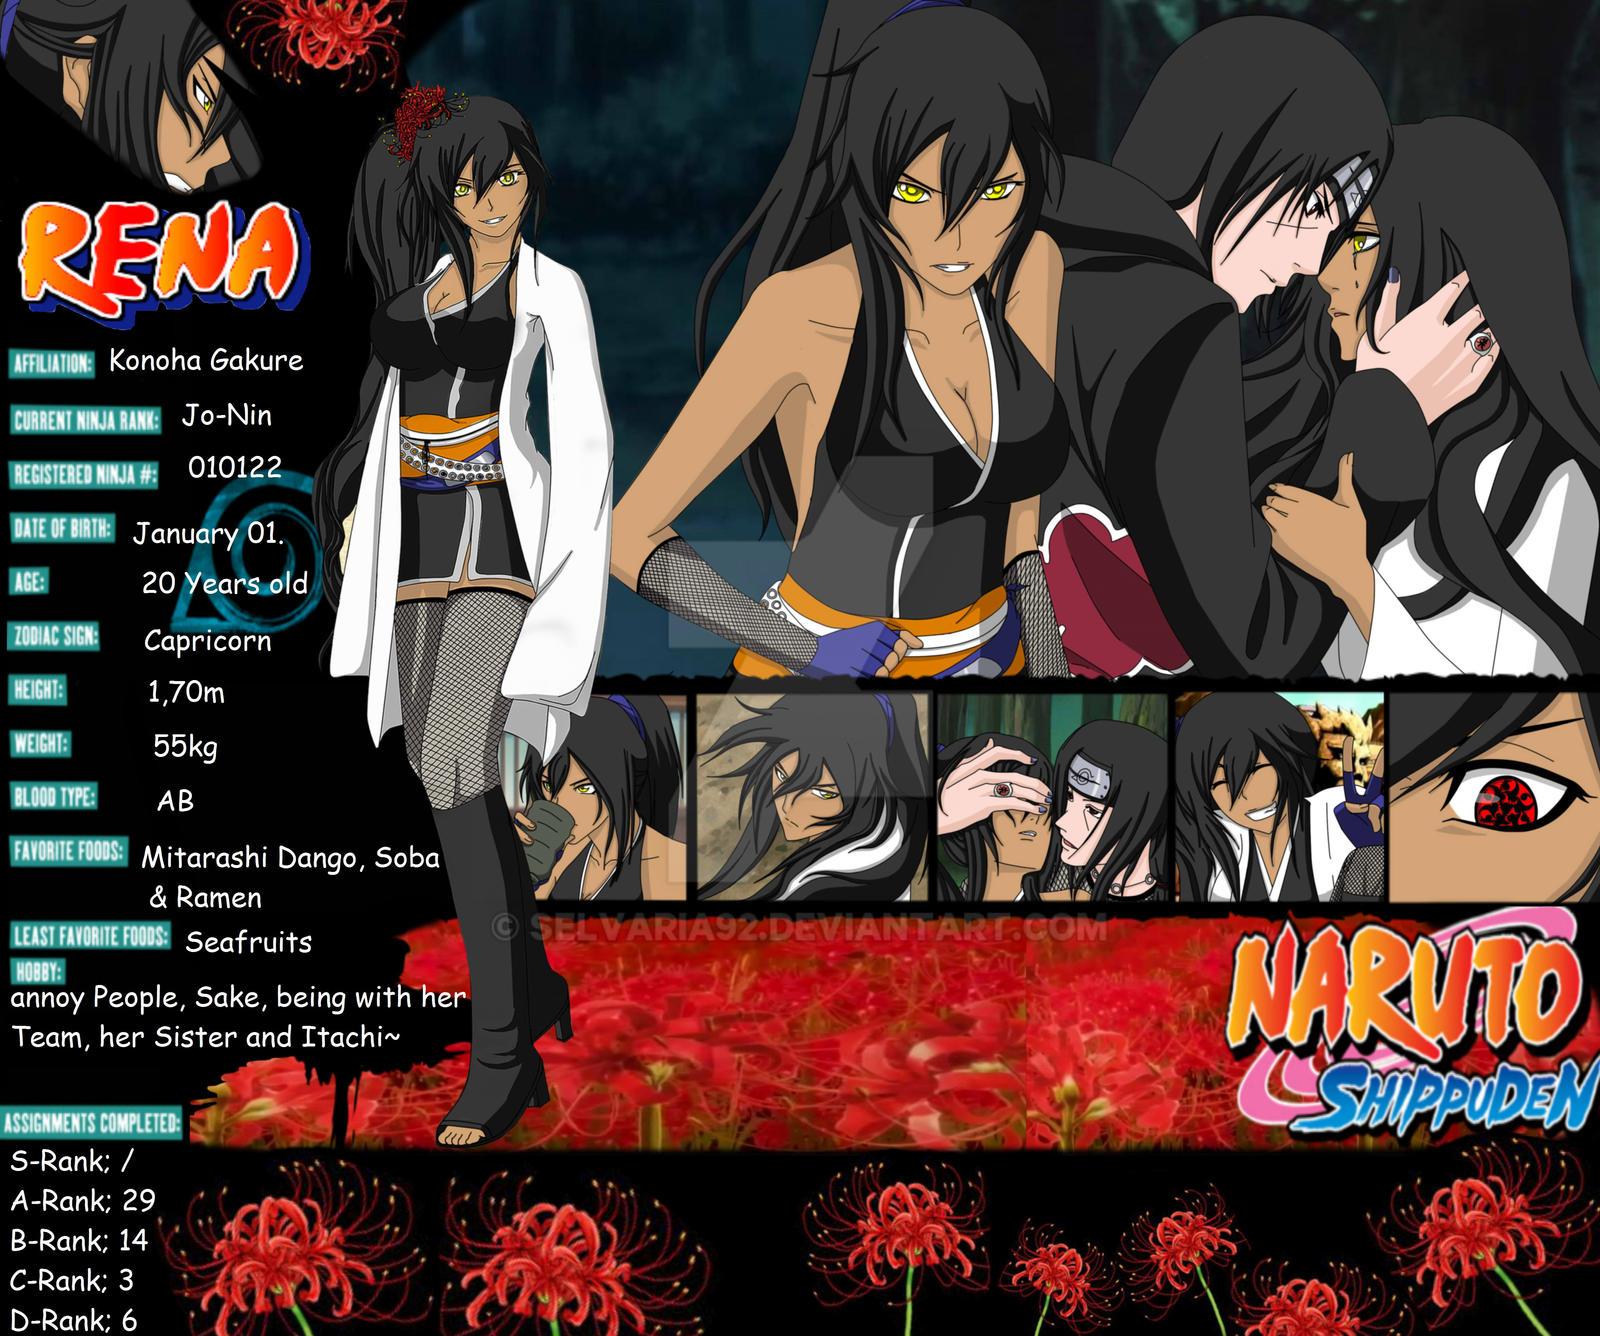 Naruto Oc~ Uchiha Rena Profile By Selvaria92 On DeviantArt